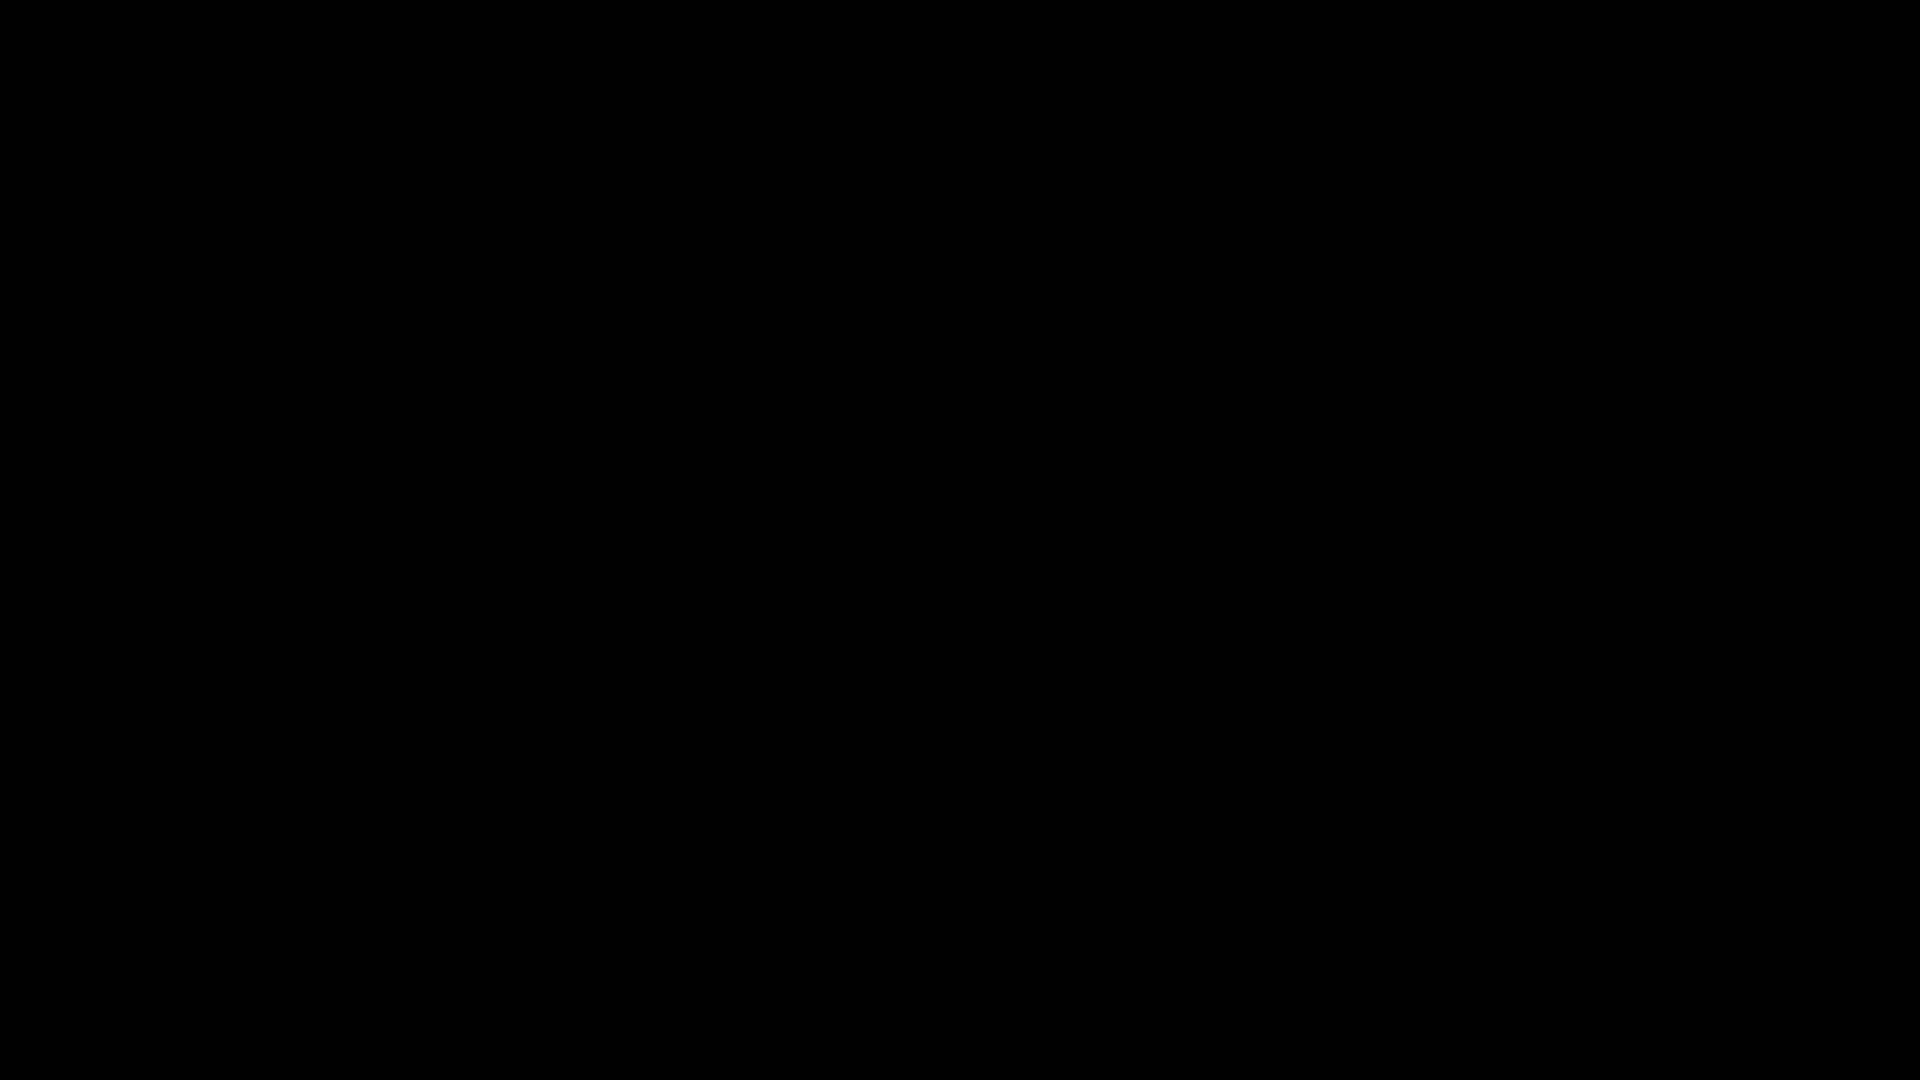 katarina radonic -